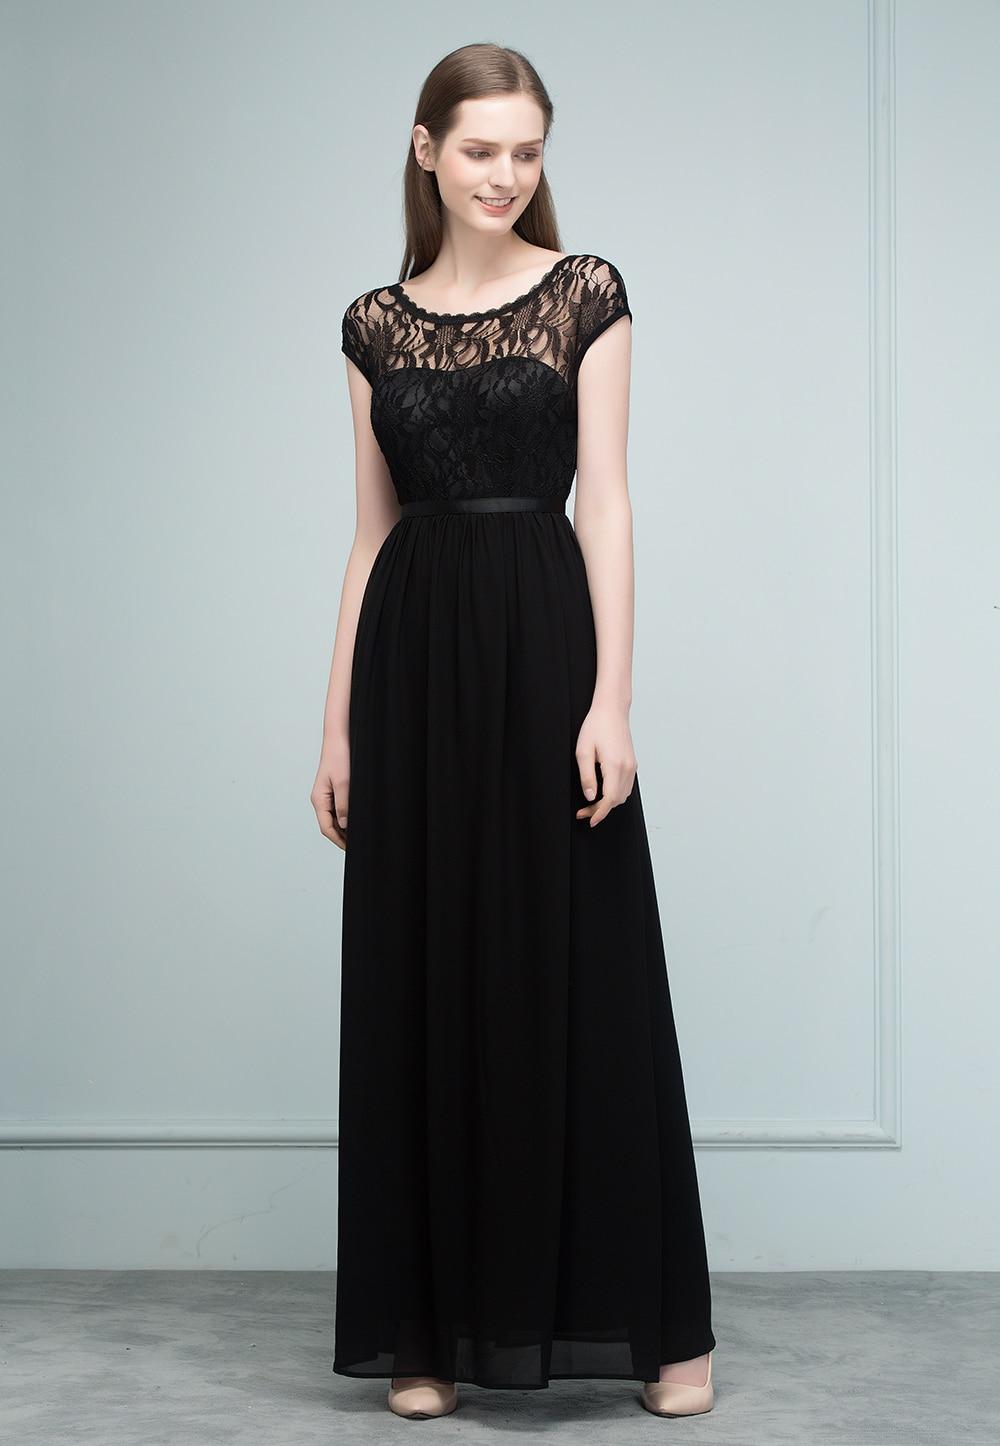 Pretty Prom Dresses Long Black Contemporary - Wedding Ideas ...